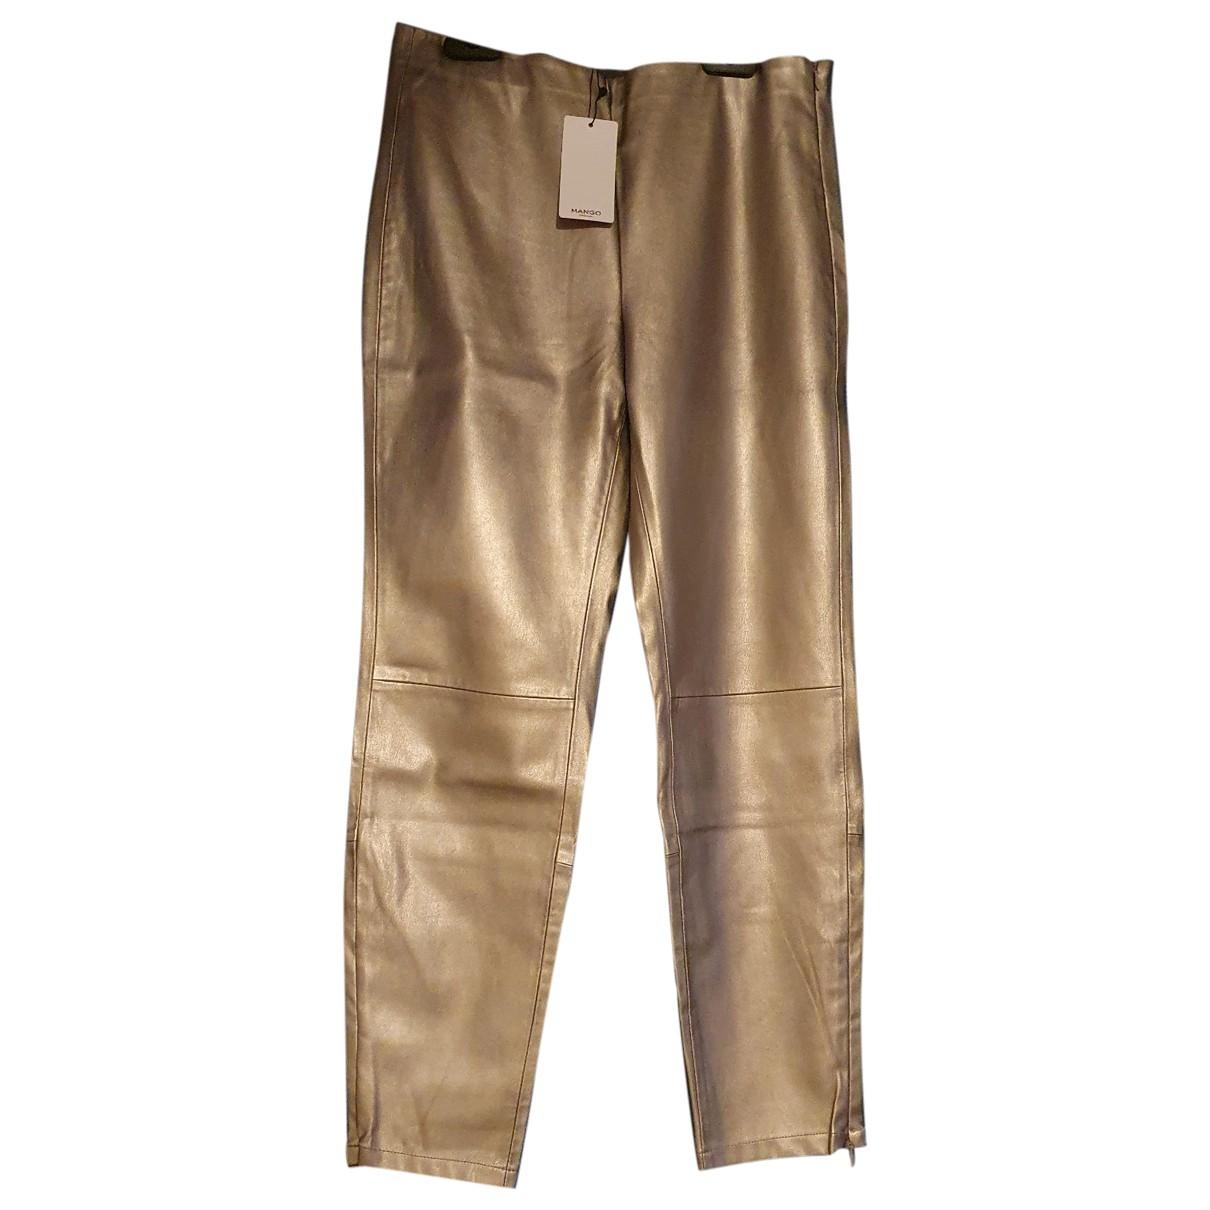 Mango \N Metallic Trousers for Women L International